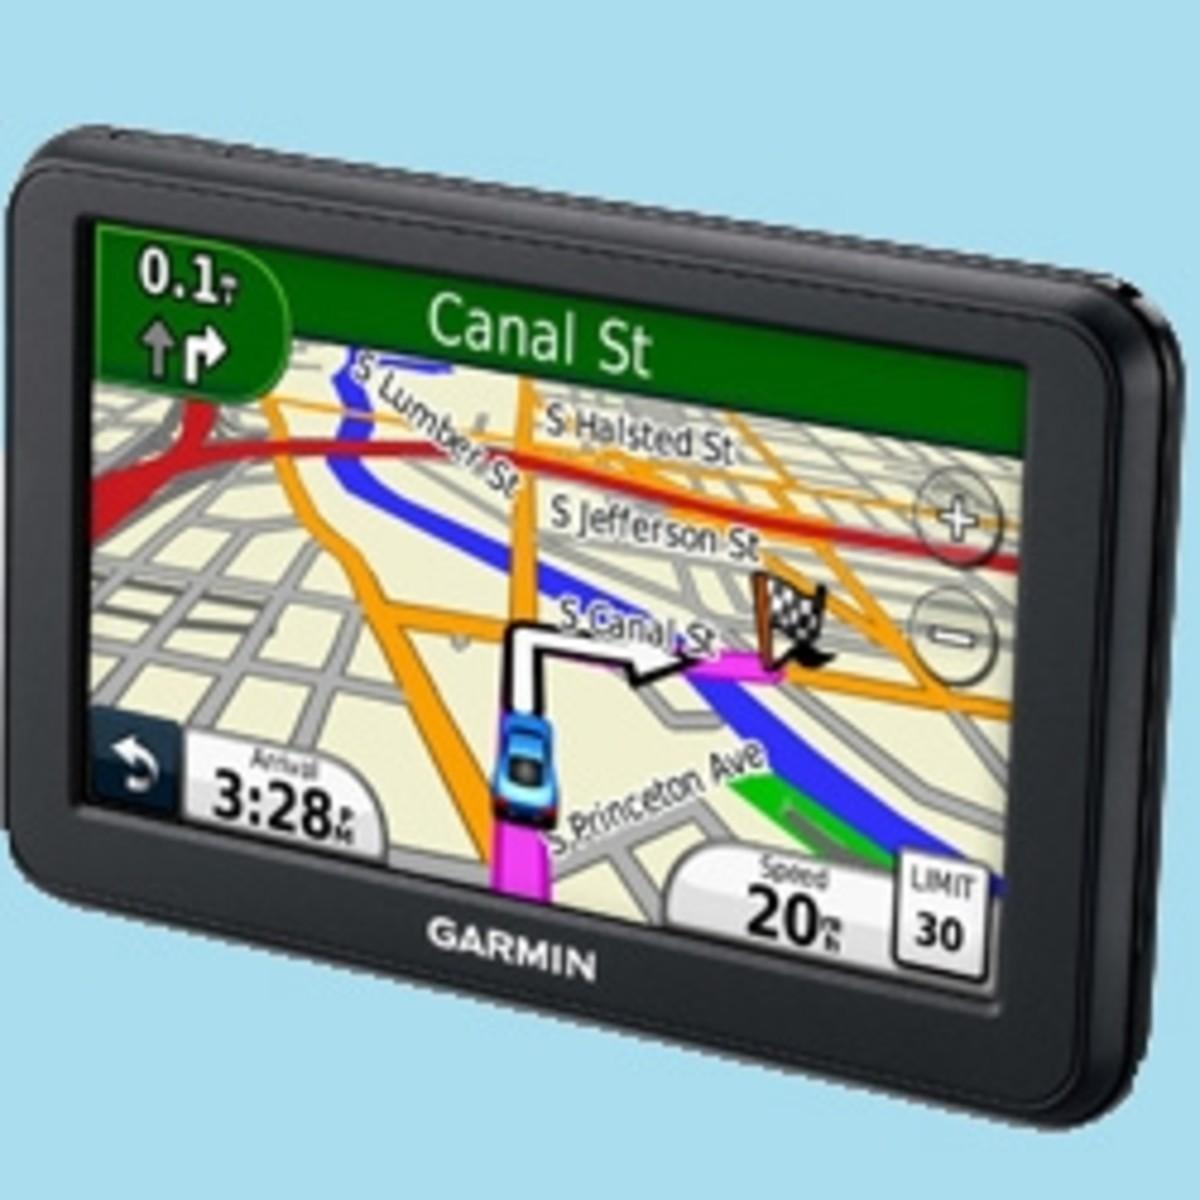 Garmin GPS Navigator for Travel